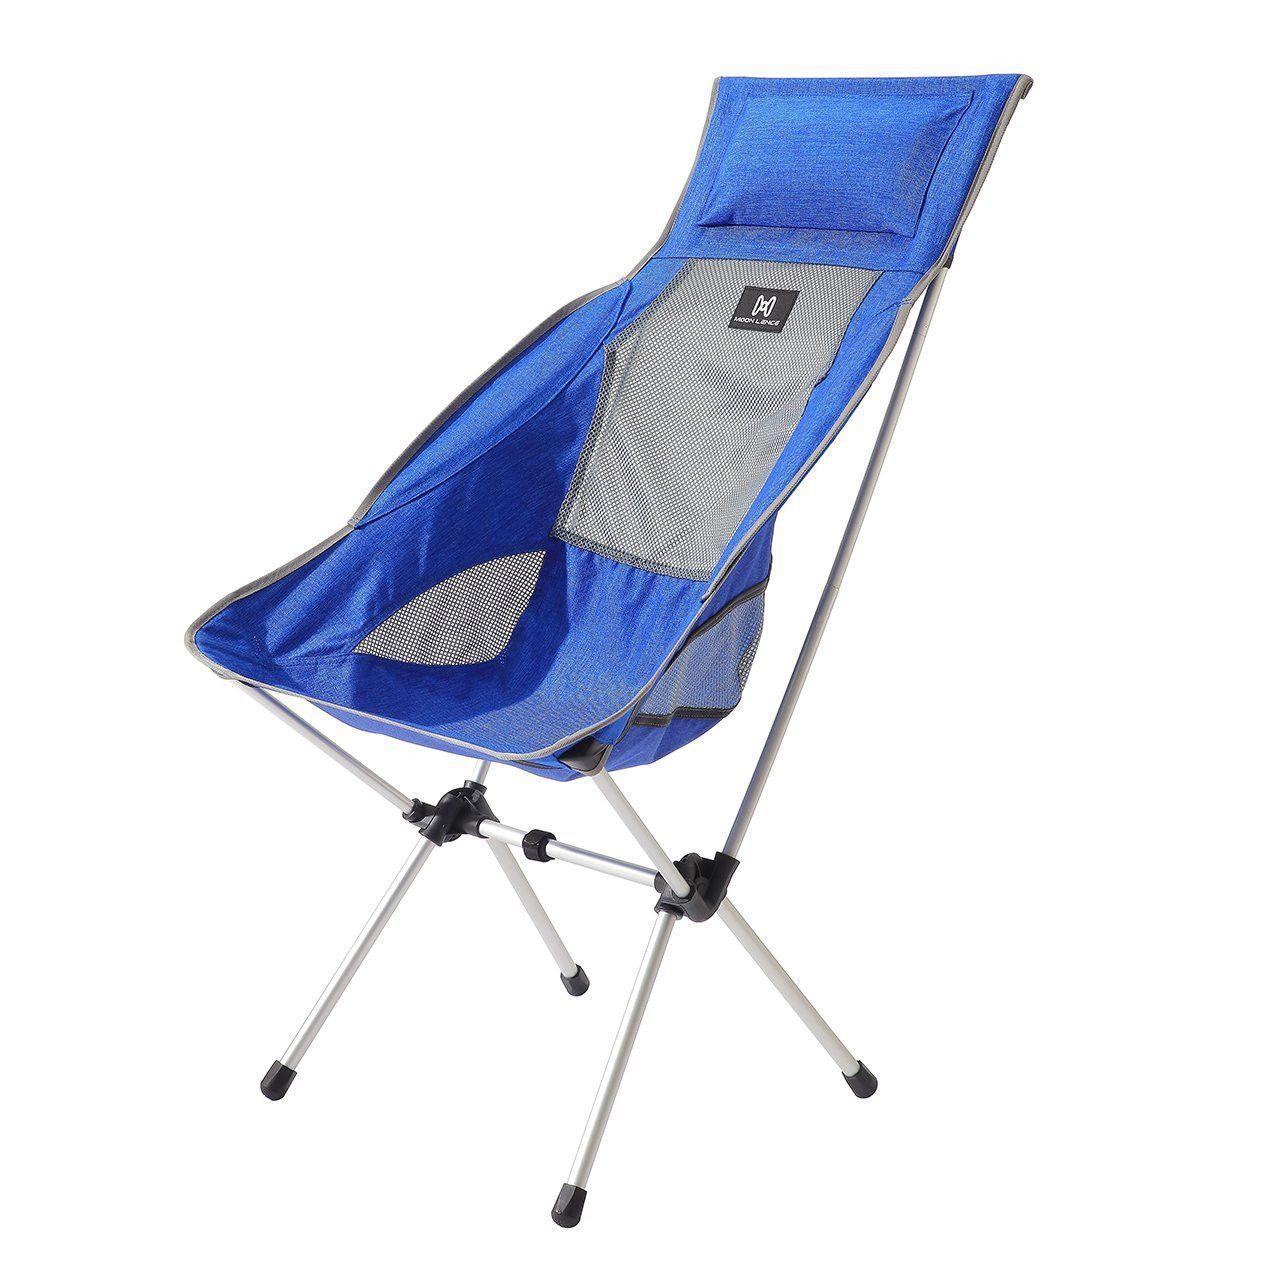 Moon Lence Ultralight Portable Folding Camping Backpacking